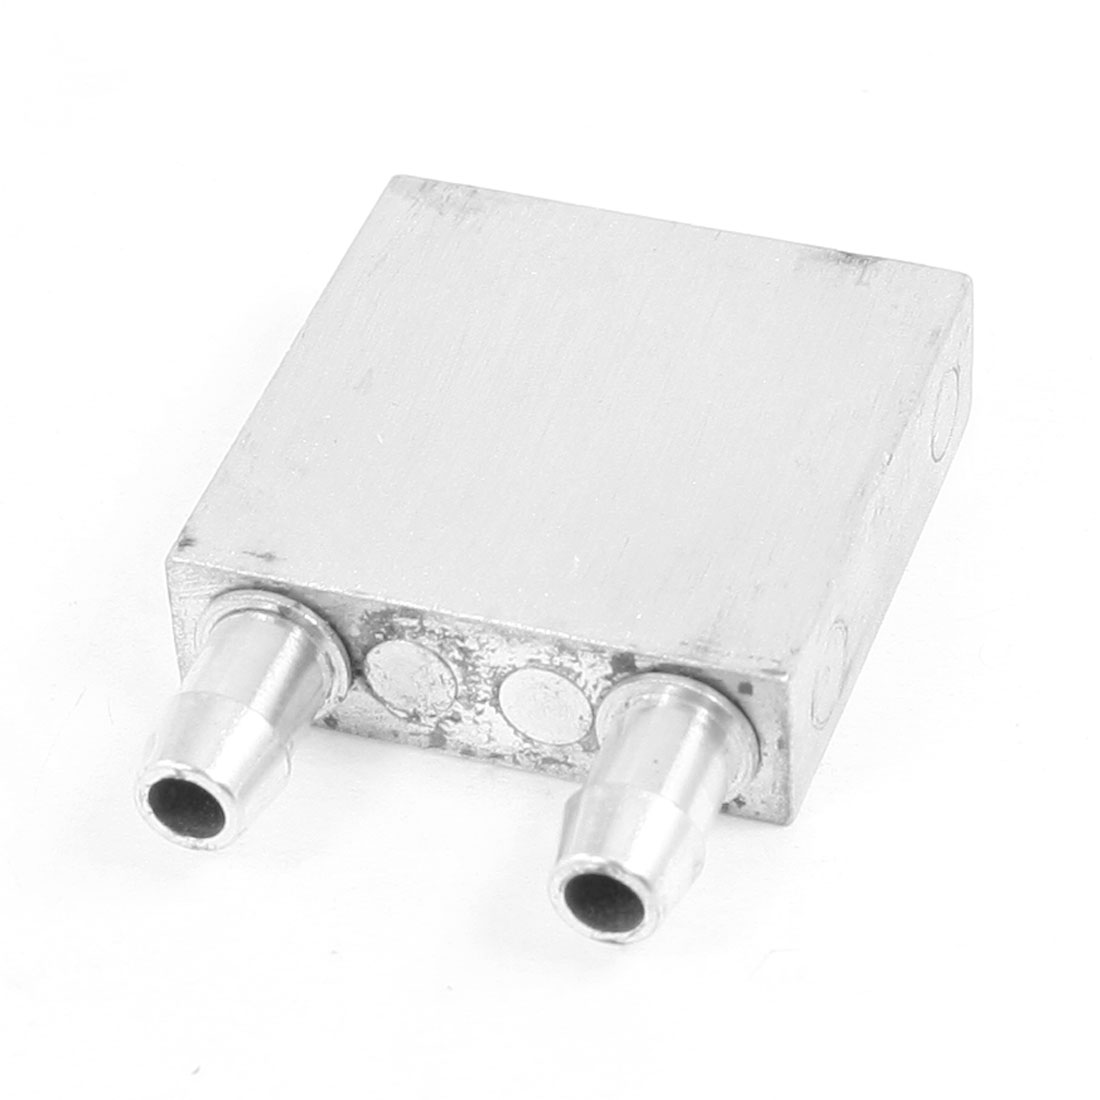 40x40x12mm Aluminum Water Cooling Block for CPU Graphics Radiator Heatsink